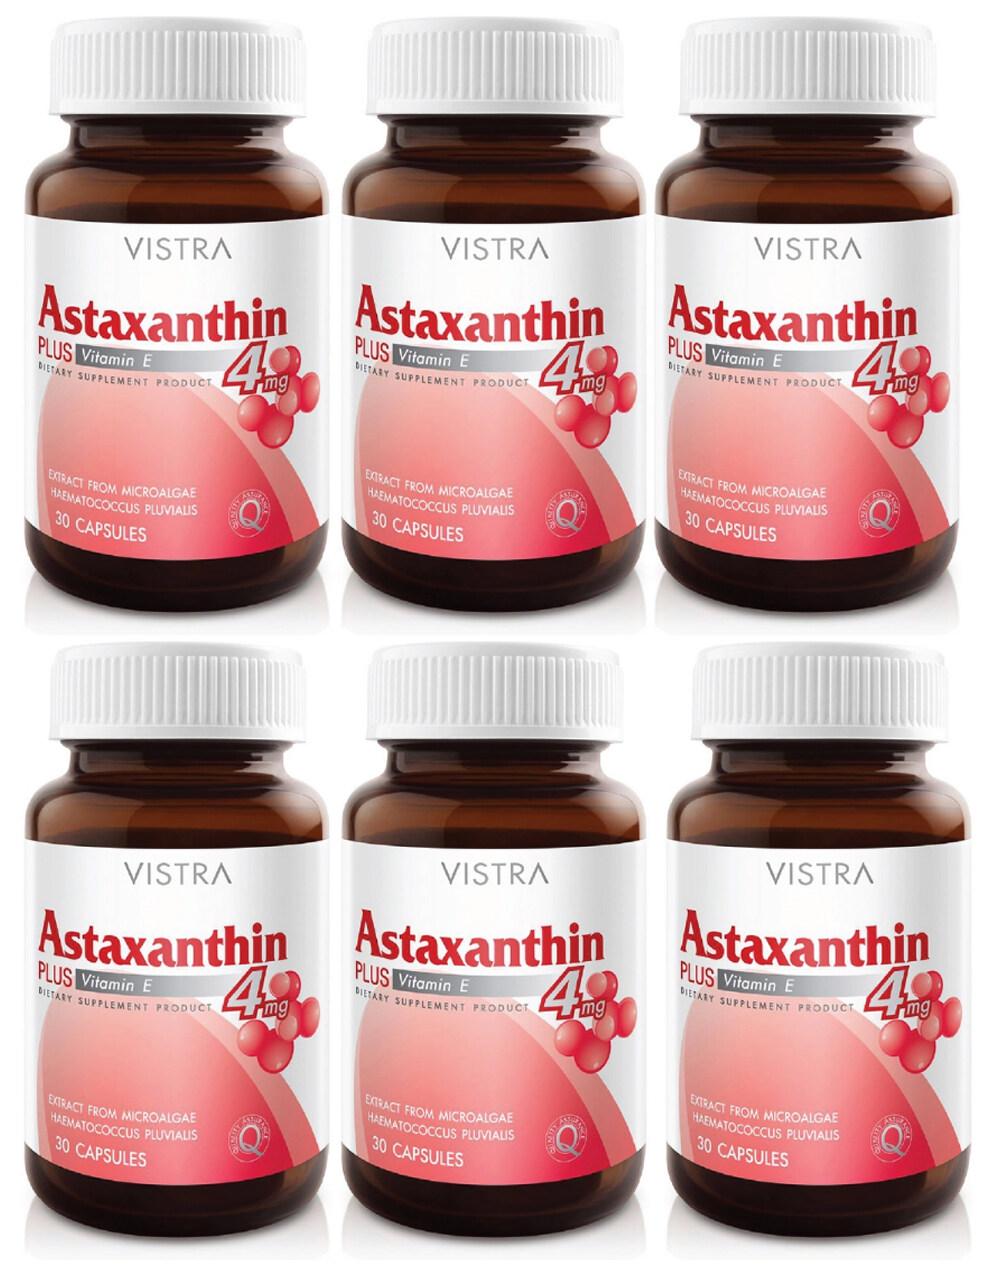 VISTRA Astaxanthin 4 mg Plus Vitamin E วิสทร้า แอสตาแซนธิน 4 มก. พลัส วิตามินอี (30 แคปซูล) x 6 ขวด